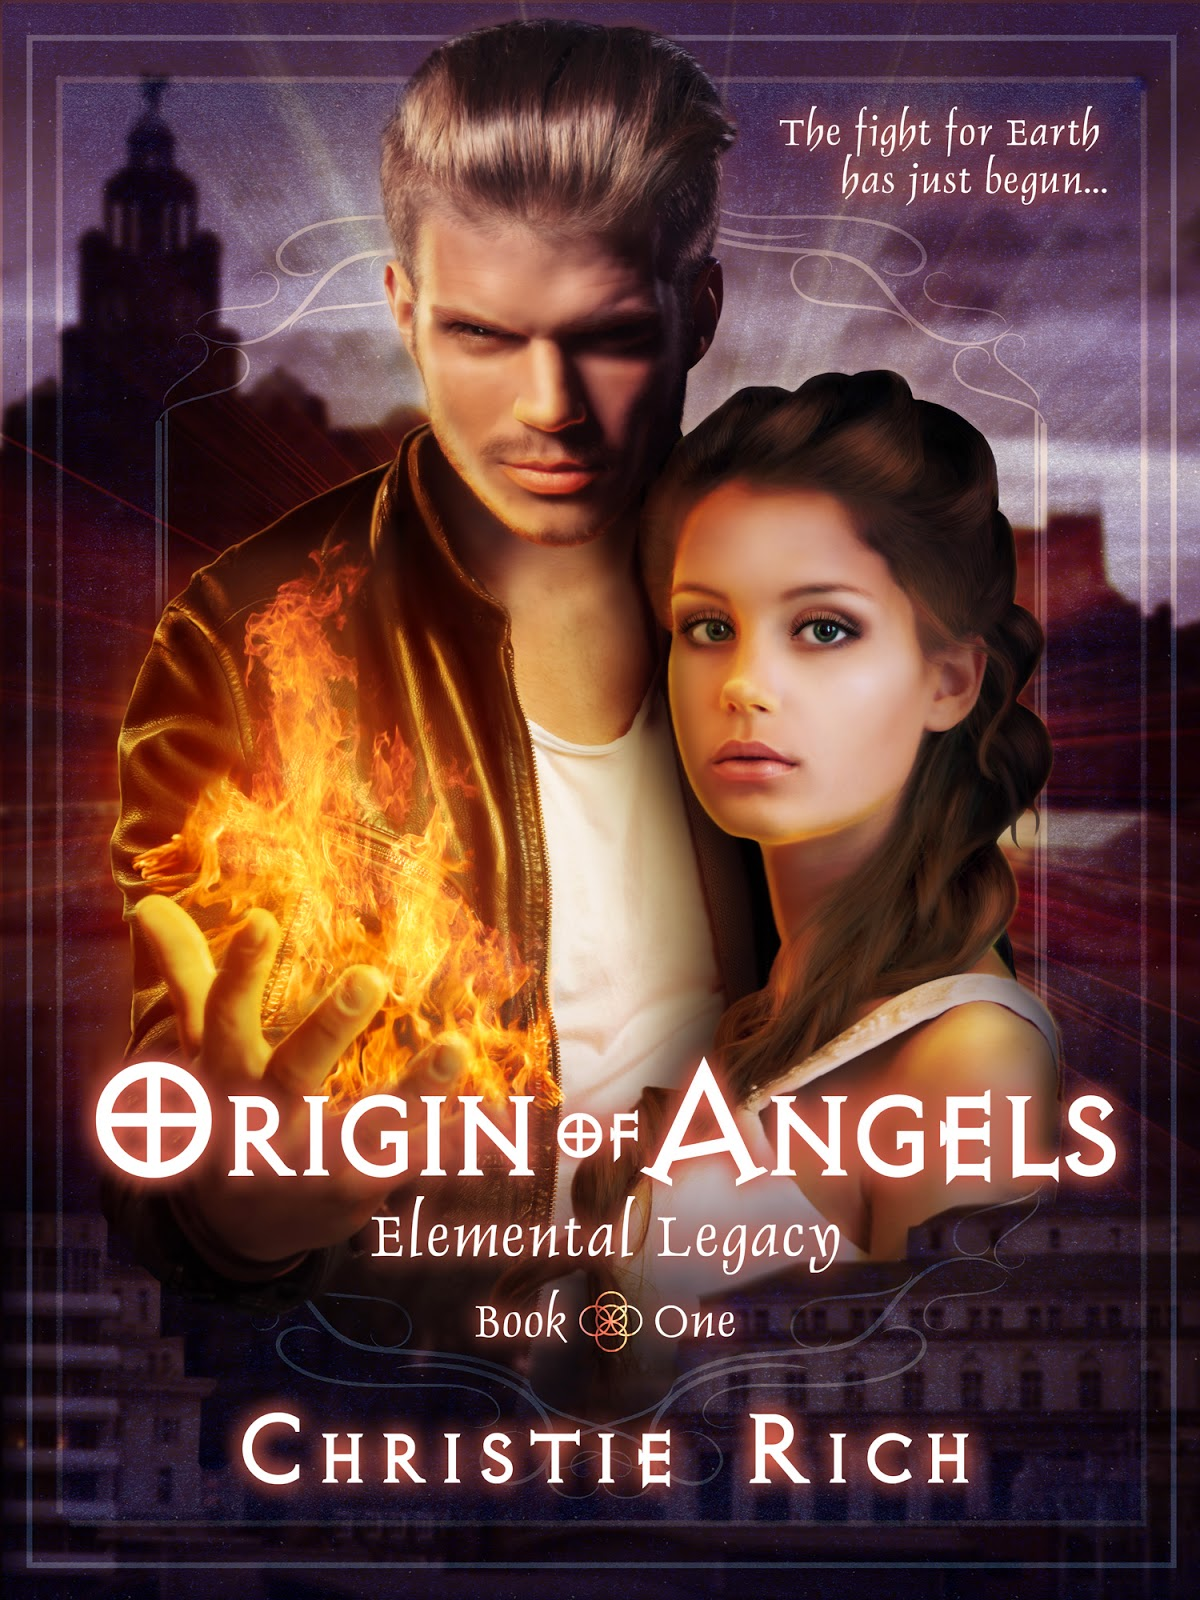 https://www.goodreads.com/book/show/23109529-origin-of-angels